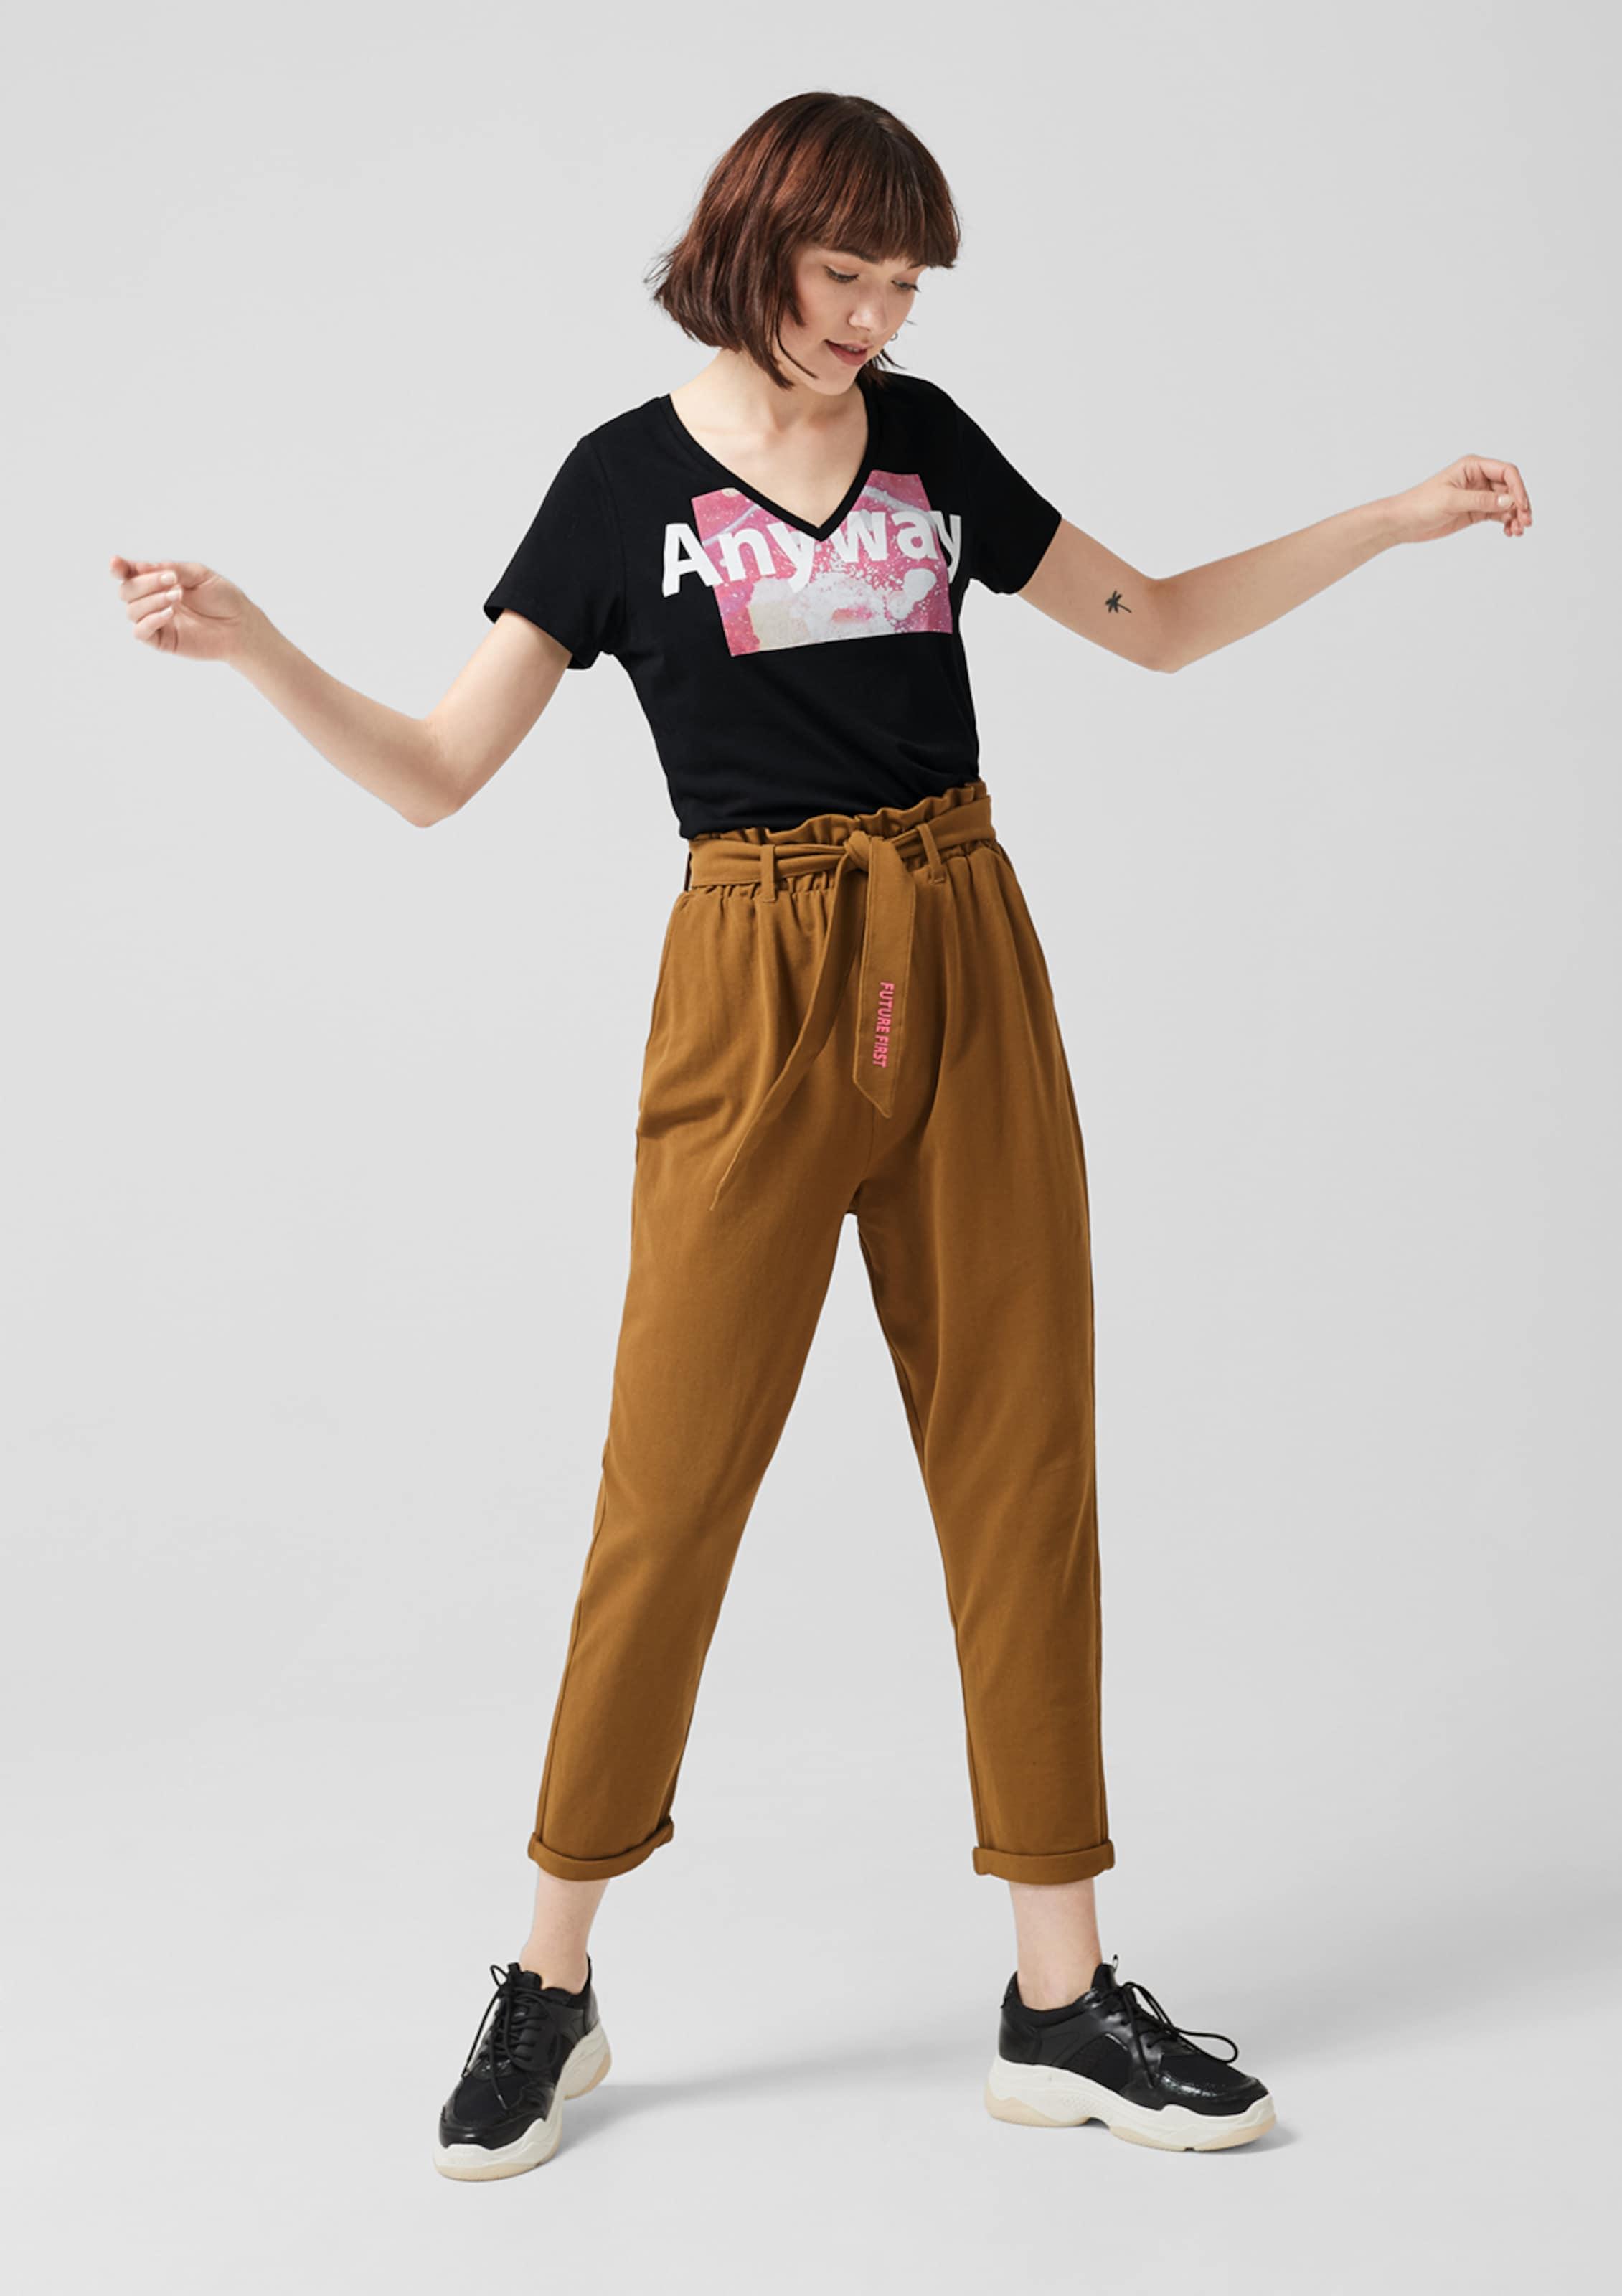 Shirt Schwarz Q s Designed In By mNw8nv0